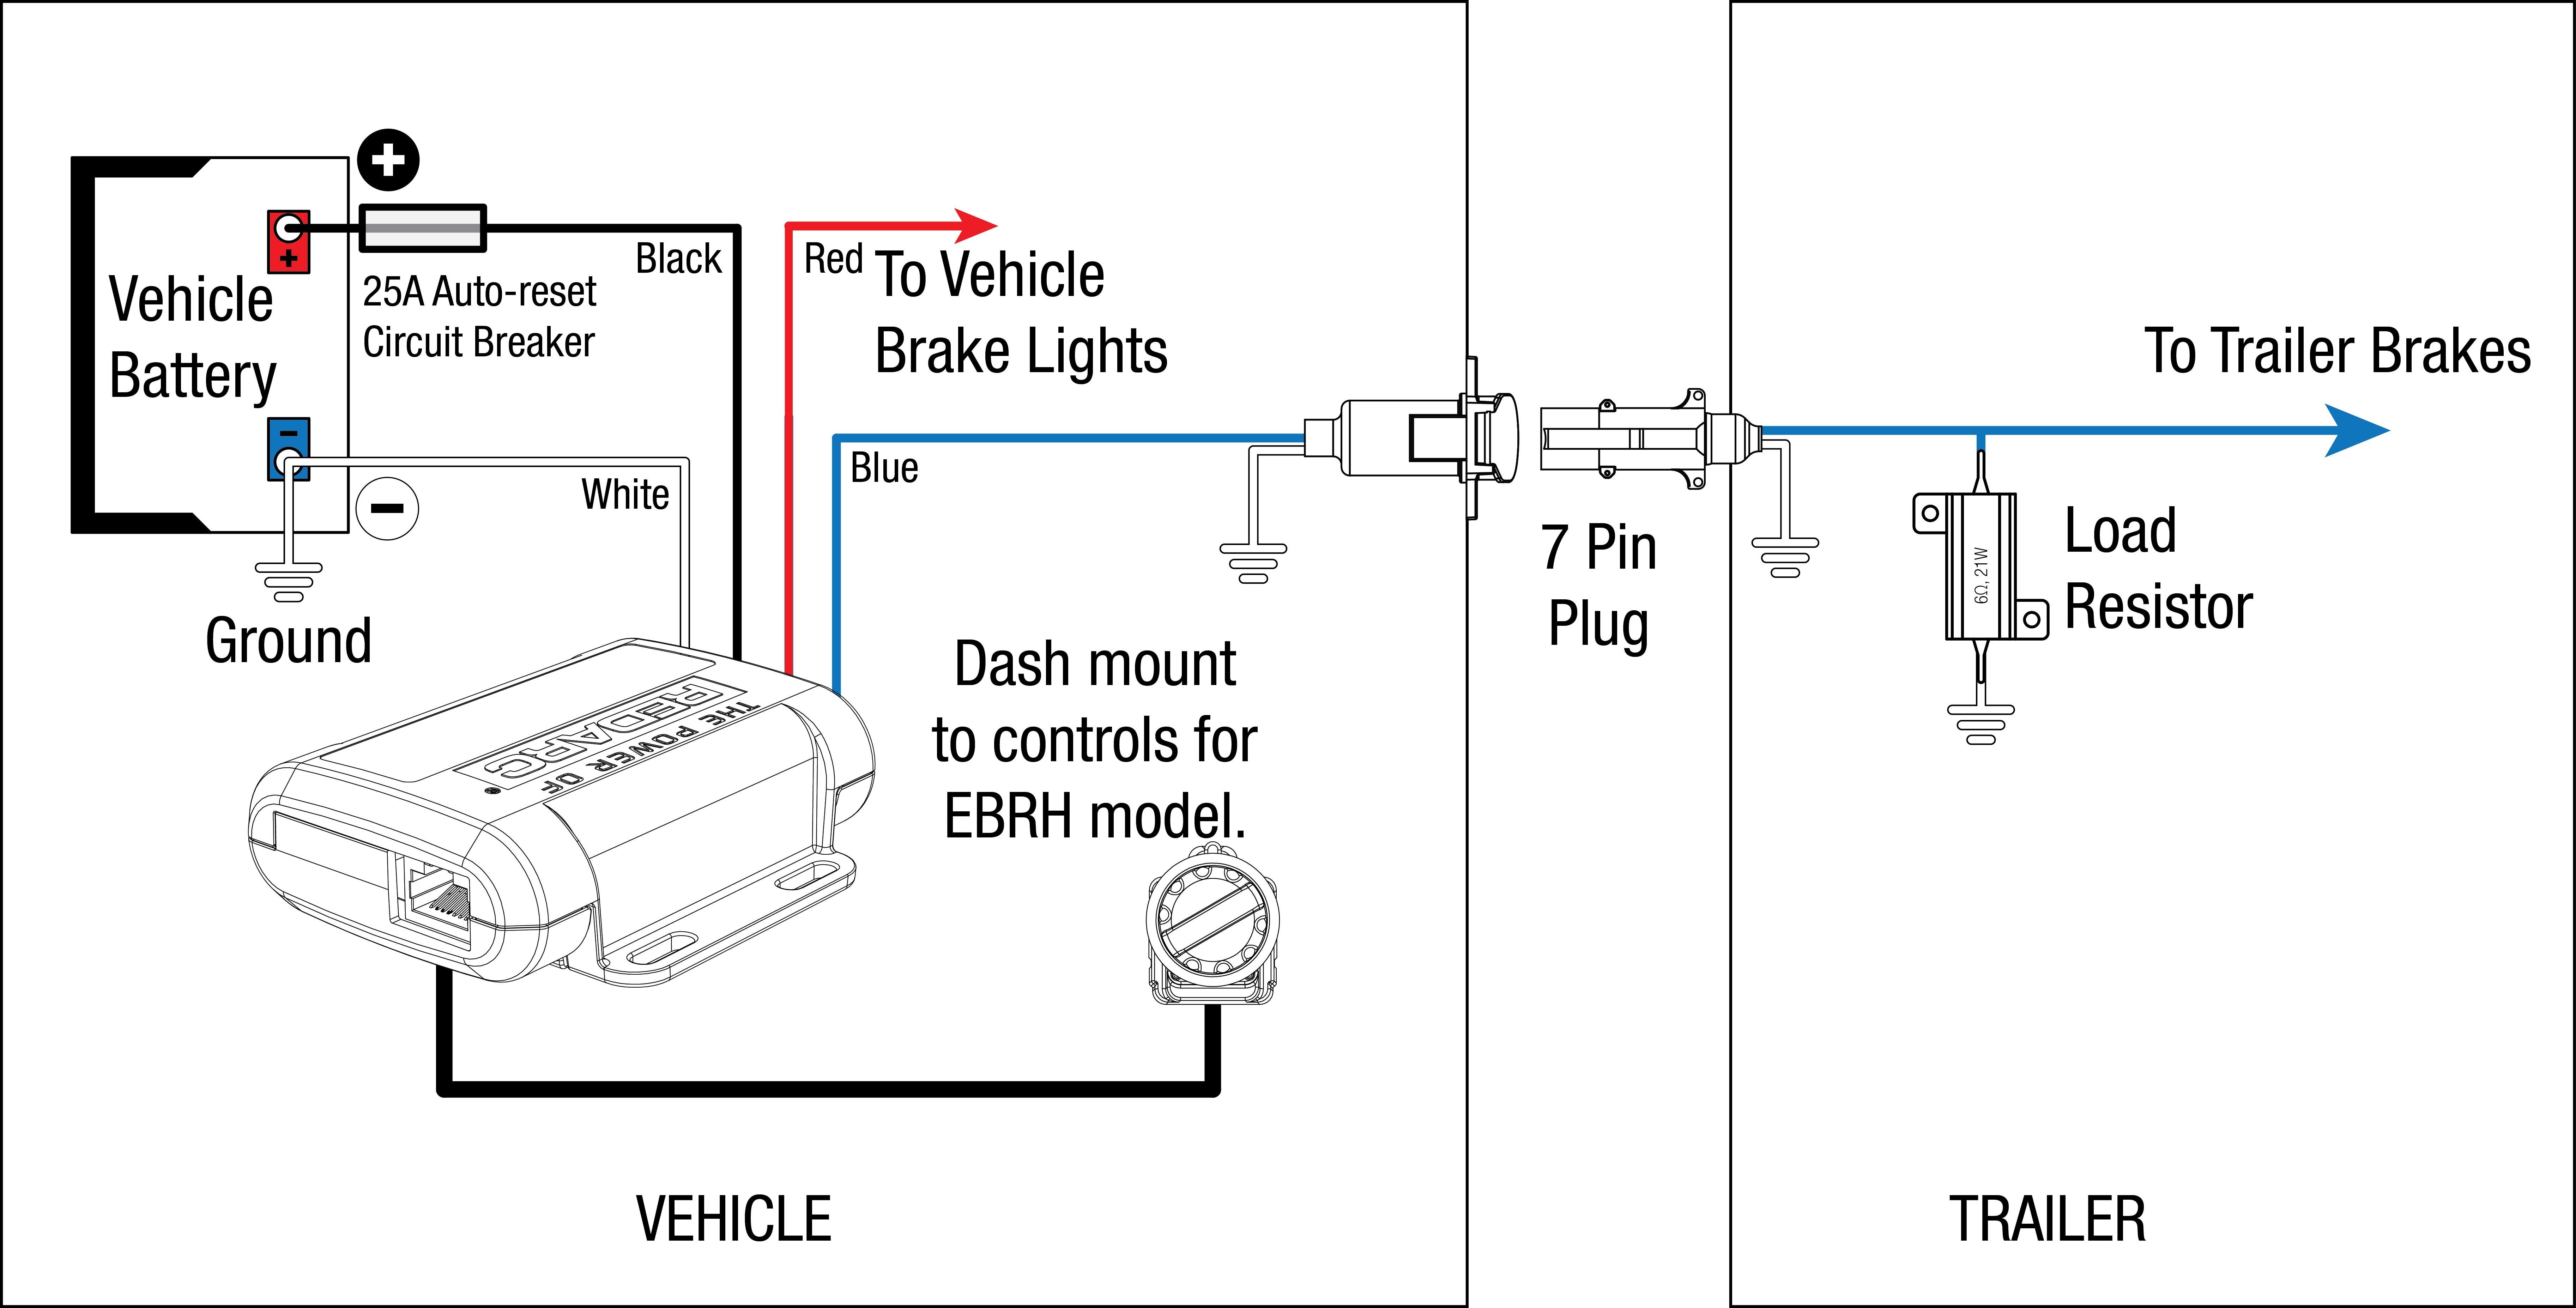 Emergency Brake Diagram Unique Light Wiring Diagram Diagram Of Emergency Brake Diagram